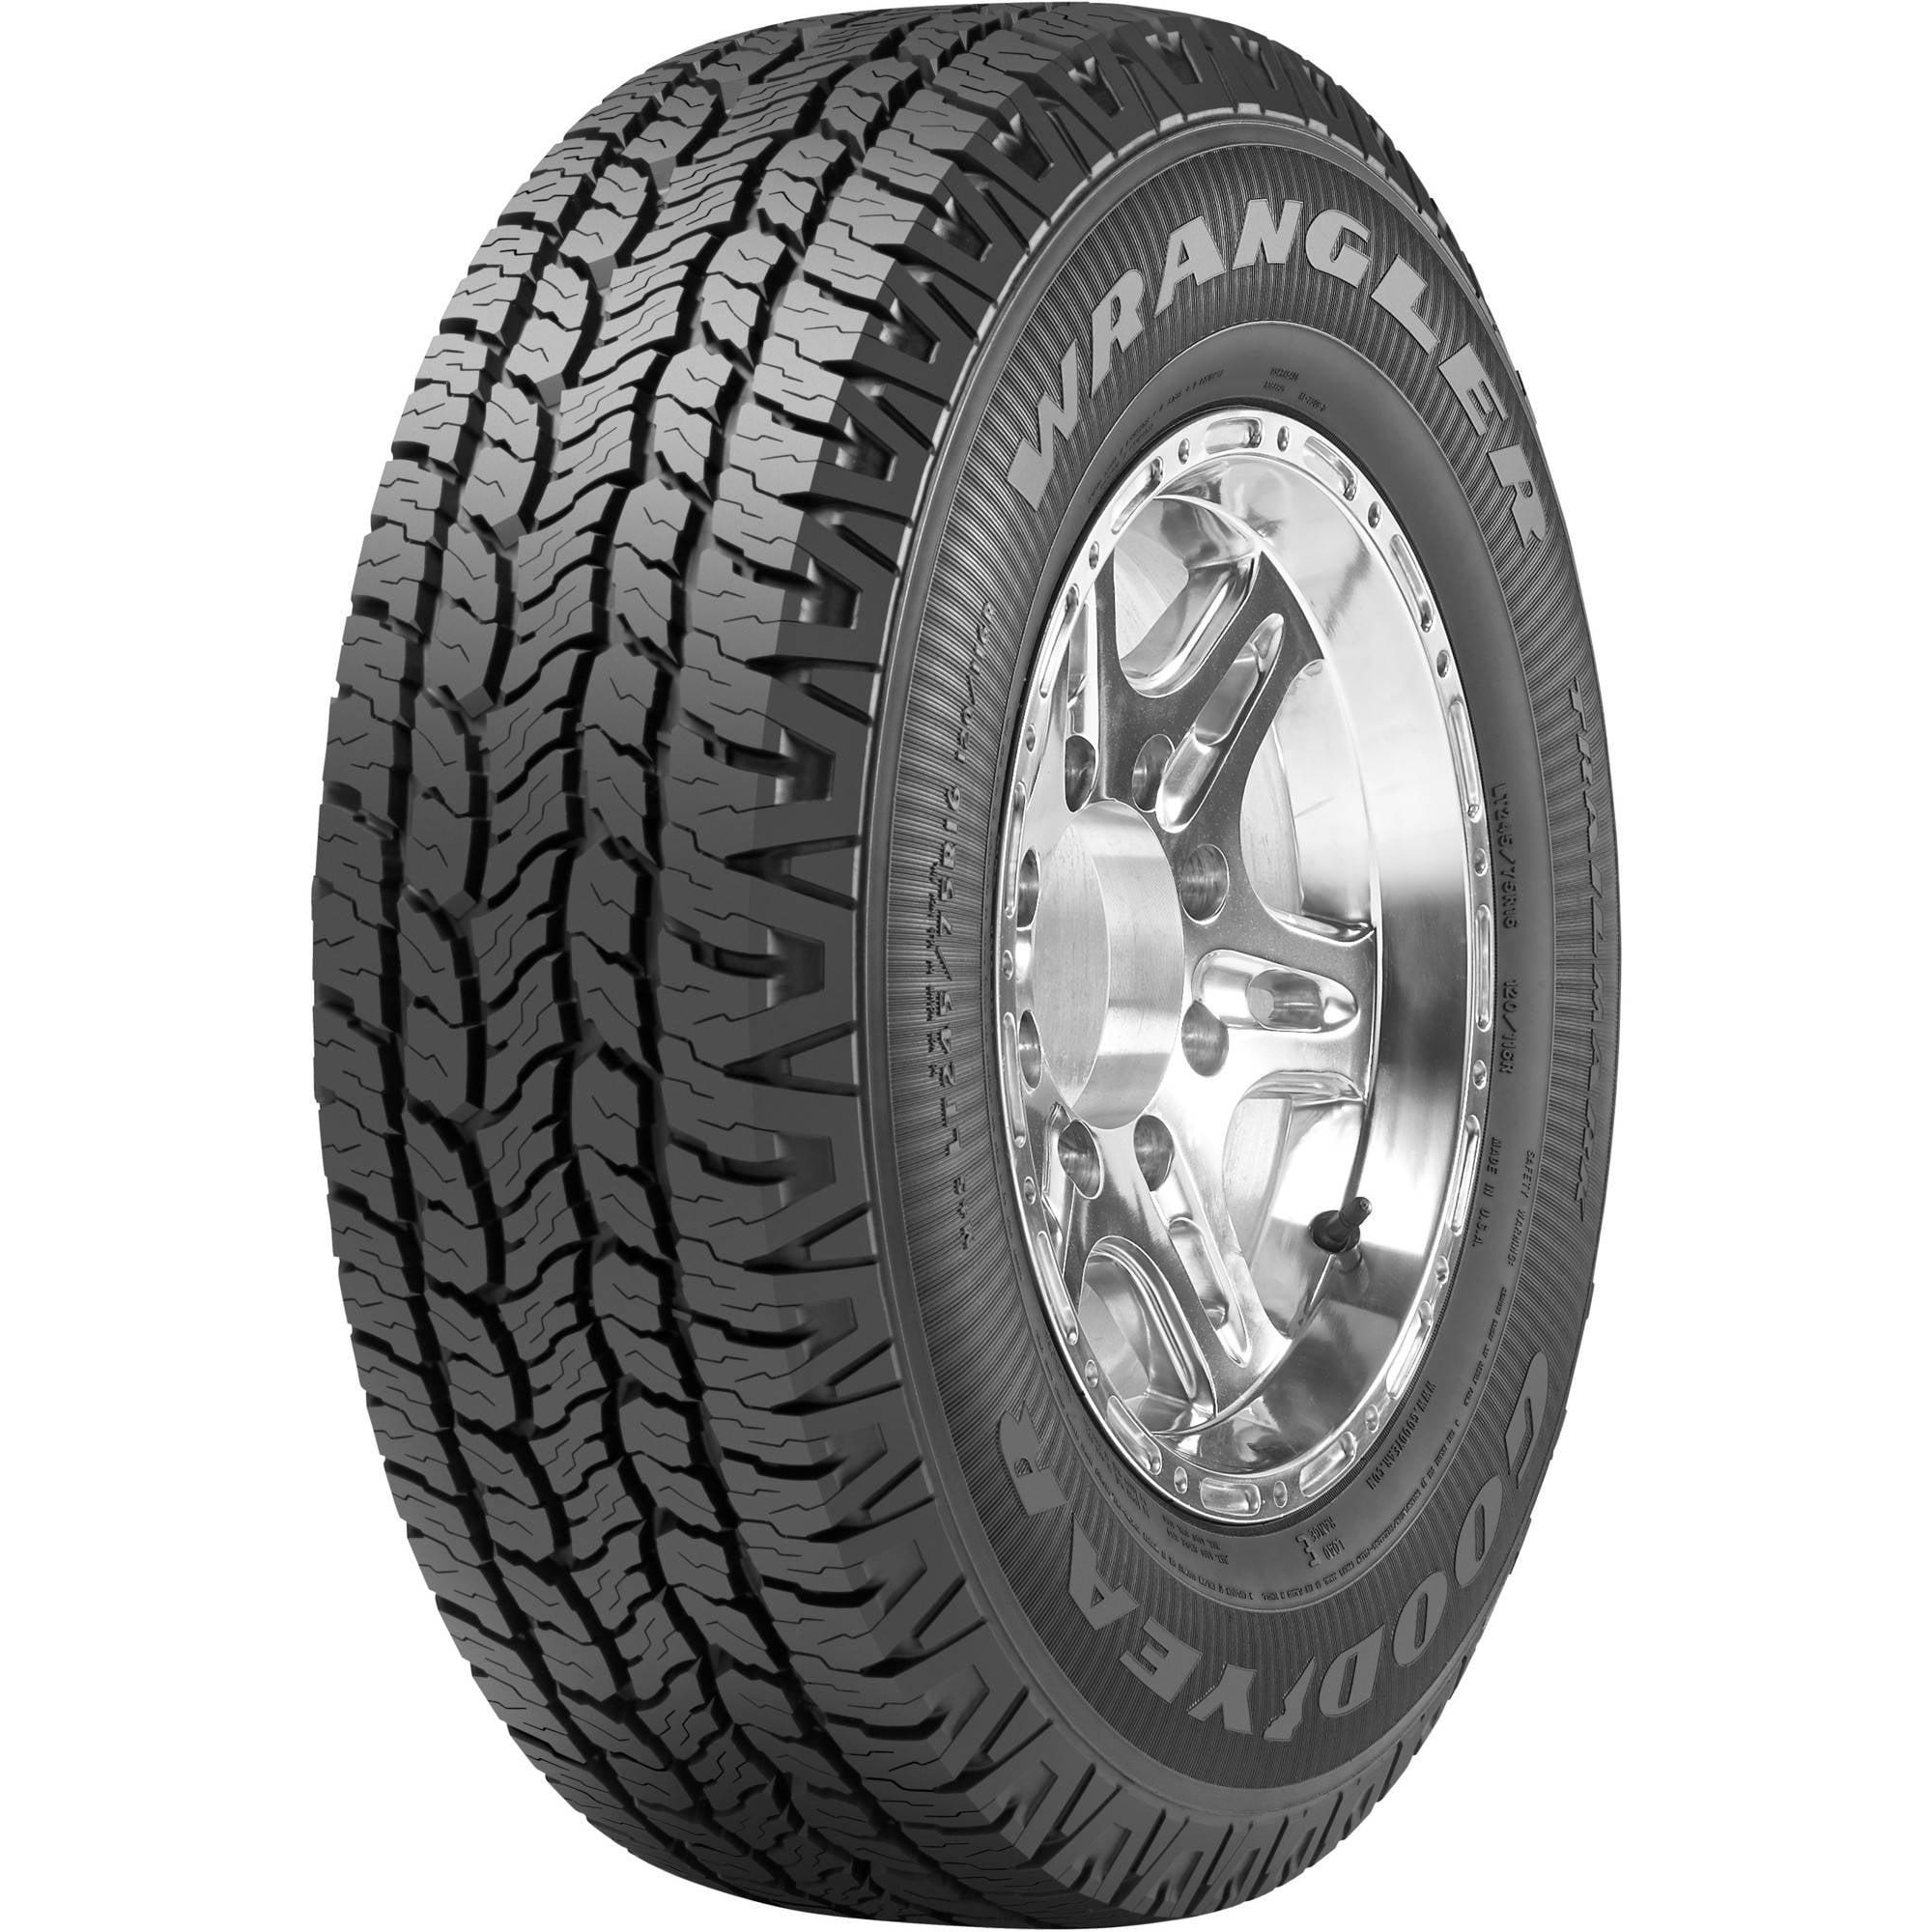 goodyear wrangler trailmark tire p26570r17 113s walmartcom